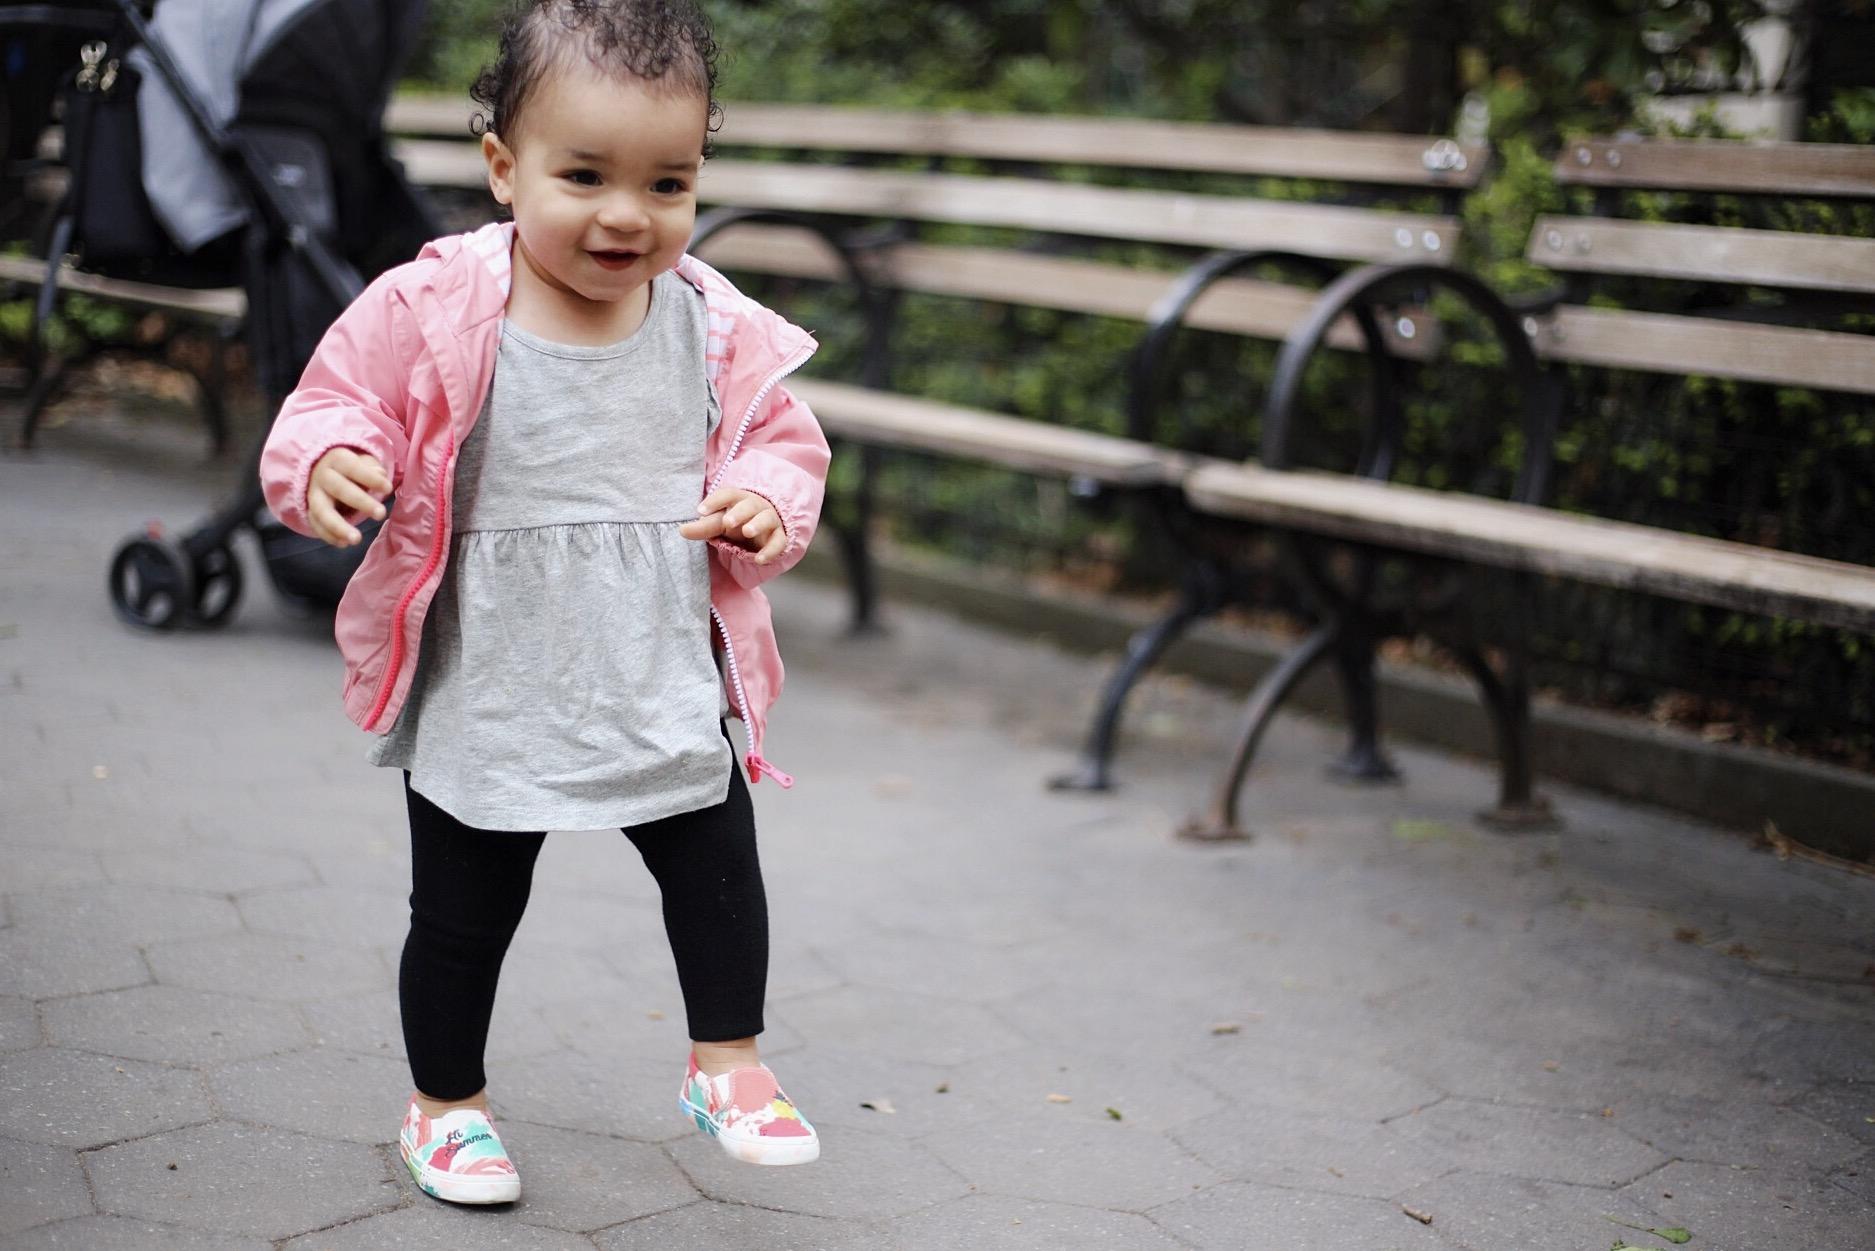 14 month milestones, zara baby, baby gap style, baby milestones, baby outfits, baby update, mom life baby update